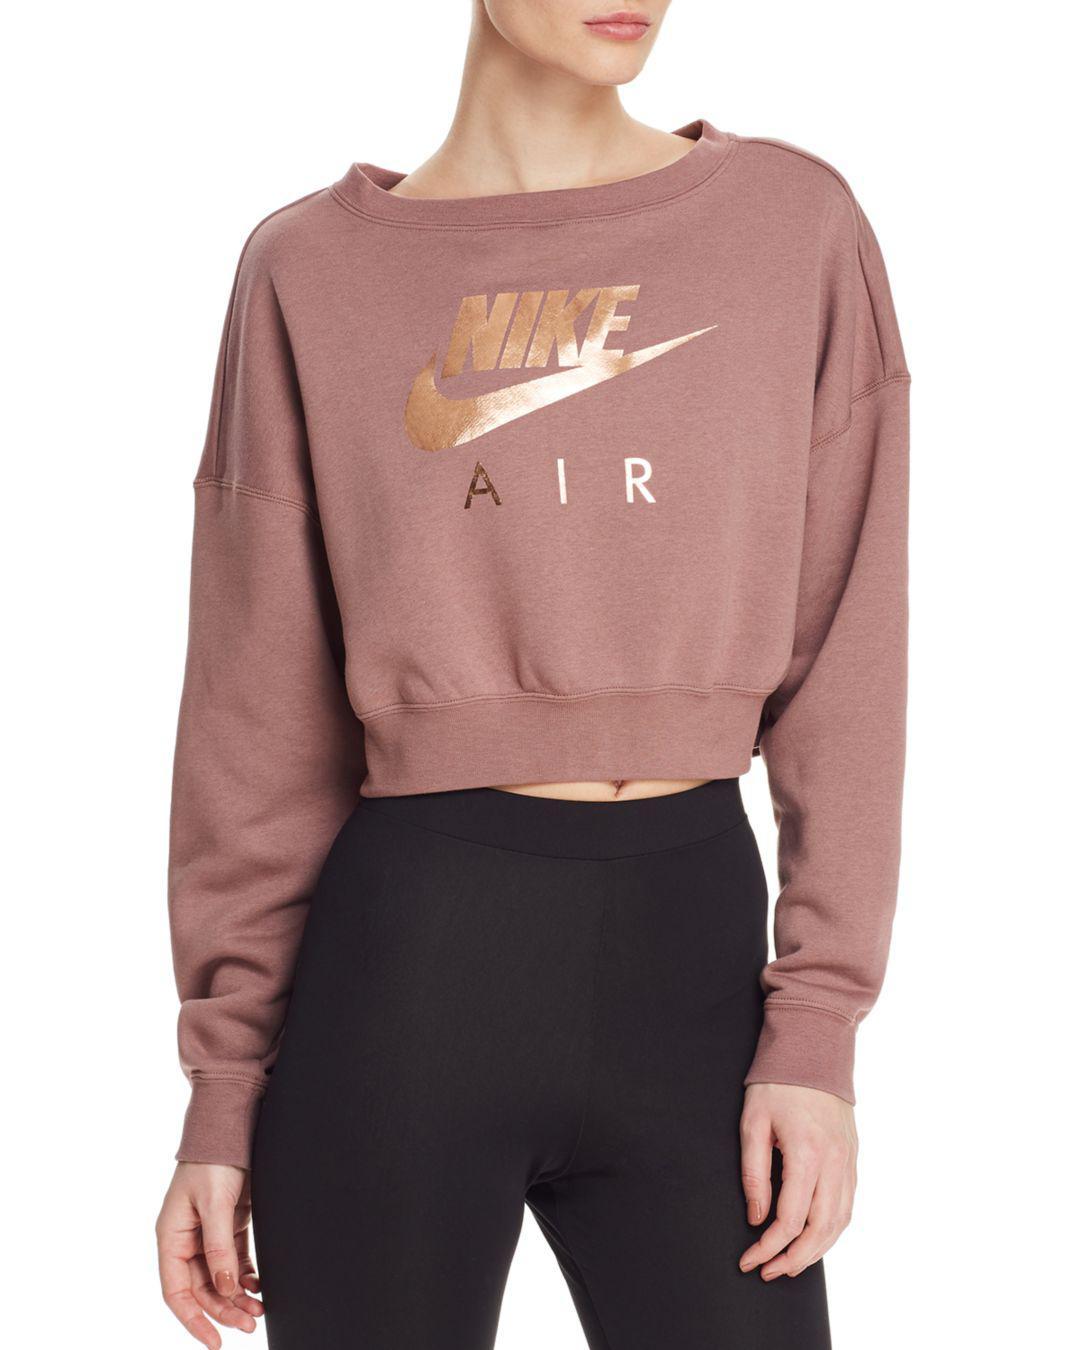 Nike Rally Air Cropped Sweatshirt Lyst [ 1350 x 1080 Pixel ]